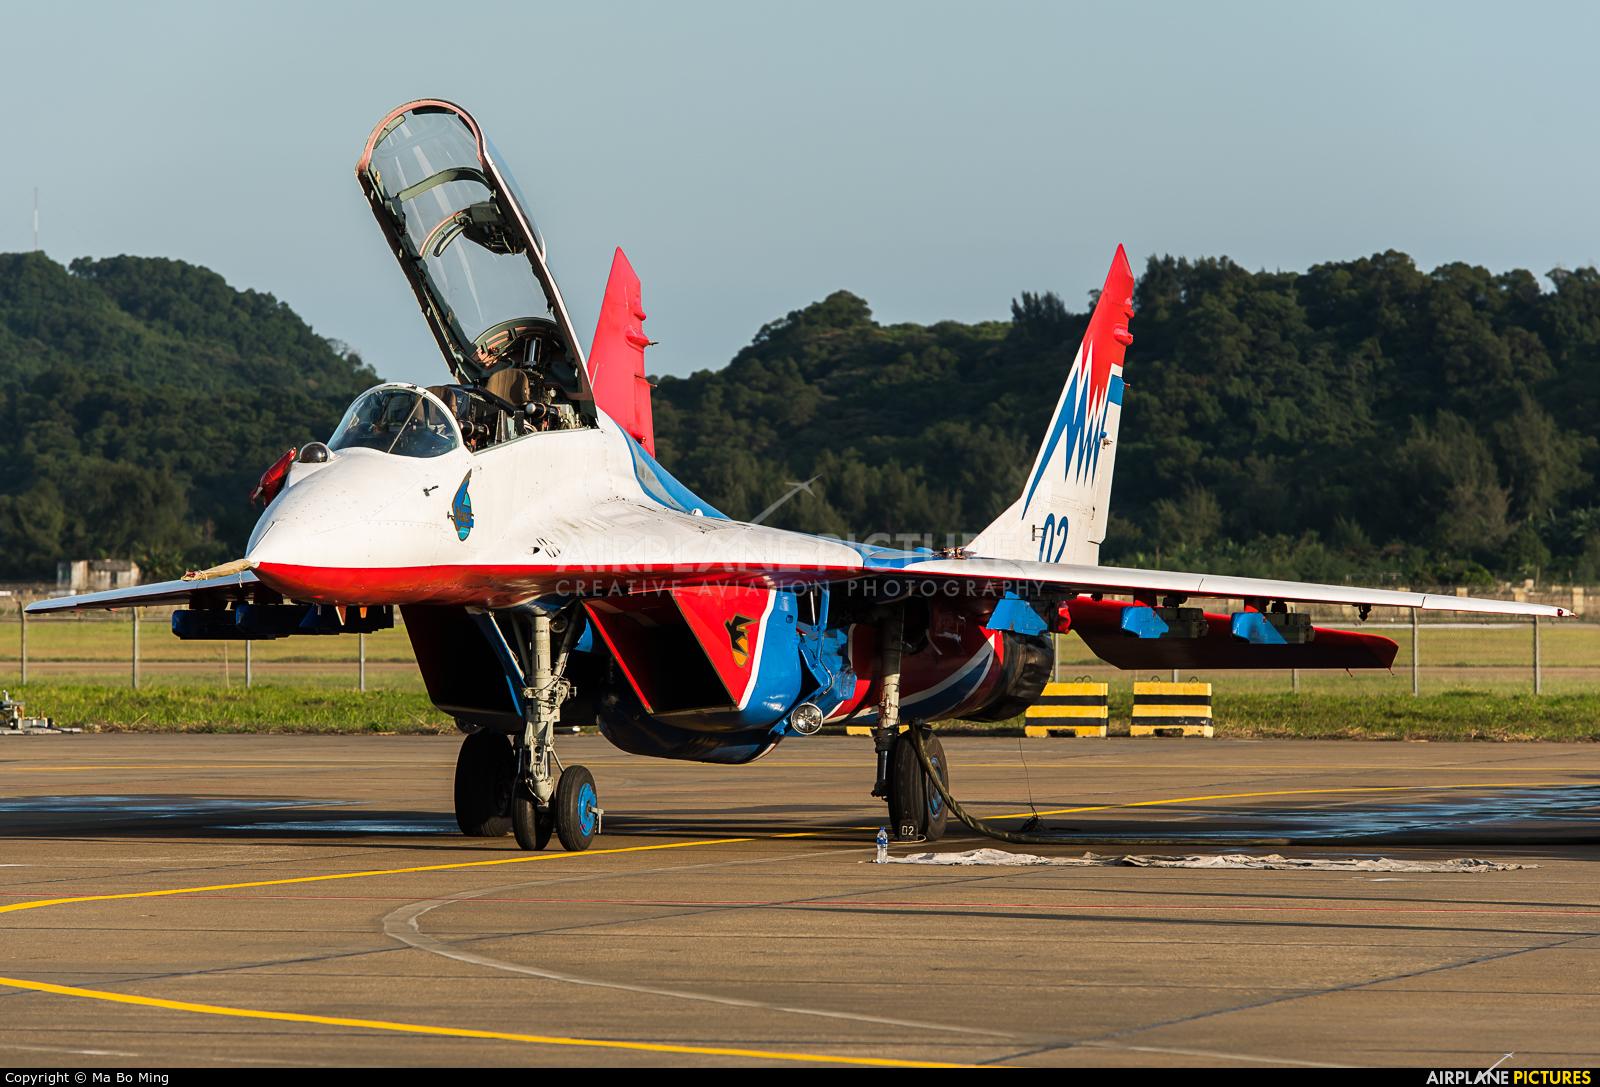 Russia - Air Force 02 BLUE aircraft at Zhūhǎi-Jīnwān